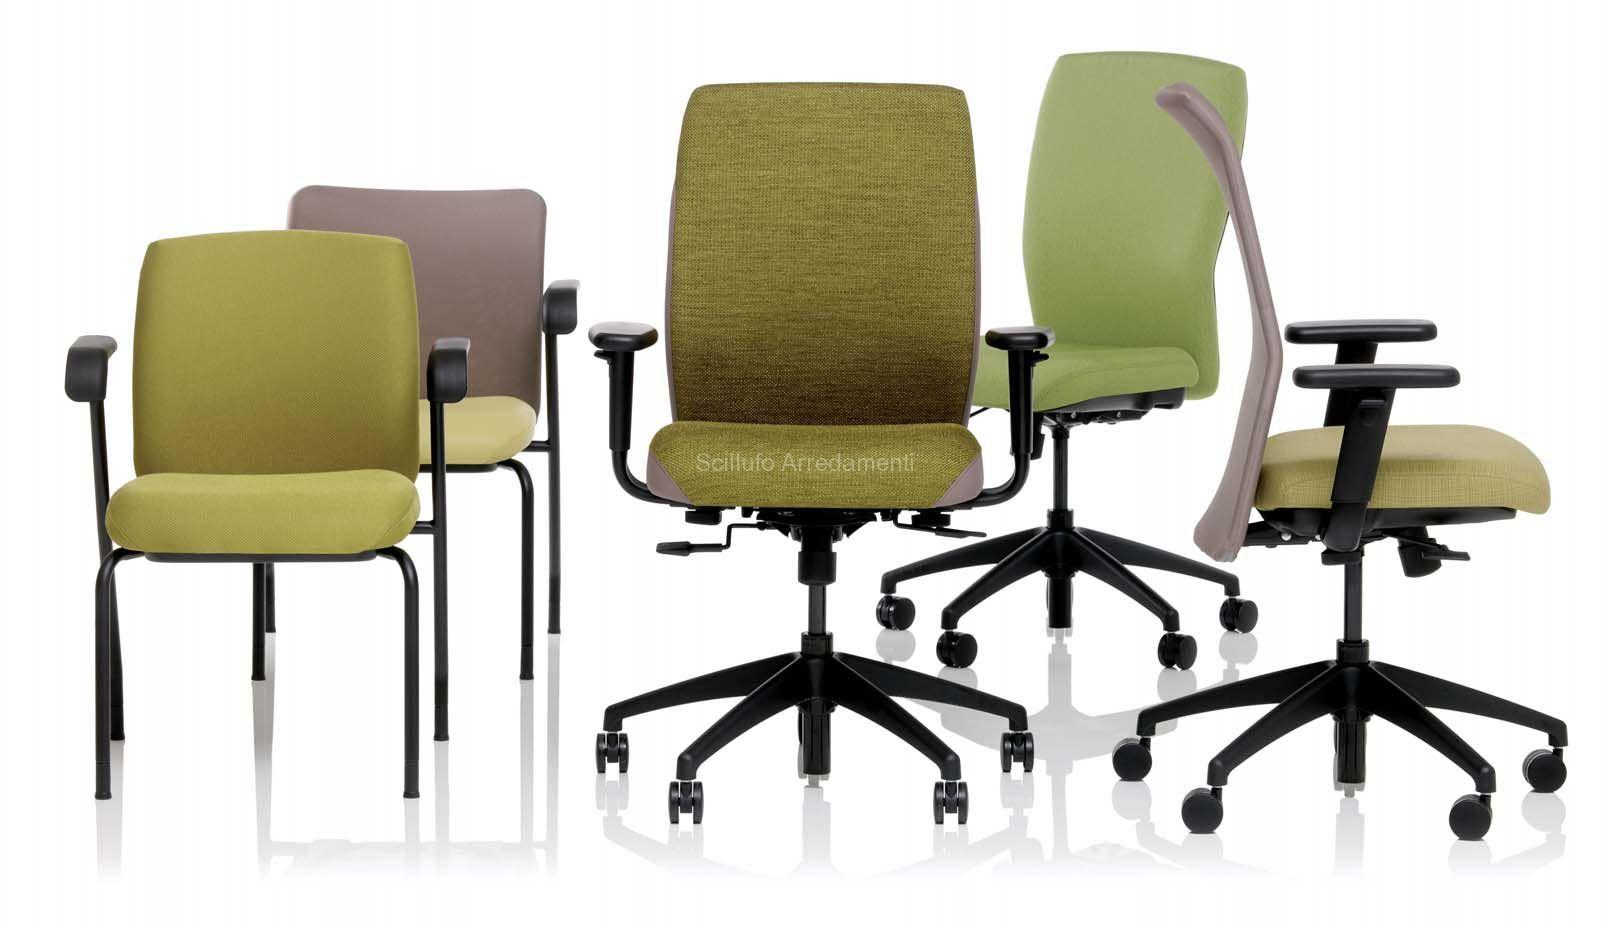 knoll office sedute scillufo arredamenti palermo. Black Bedroom Furniture Sets. Home Design Ideas